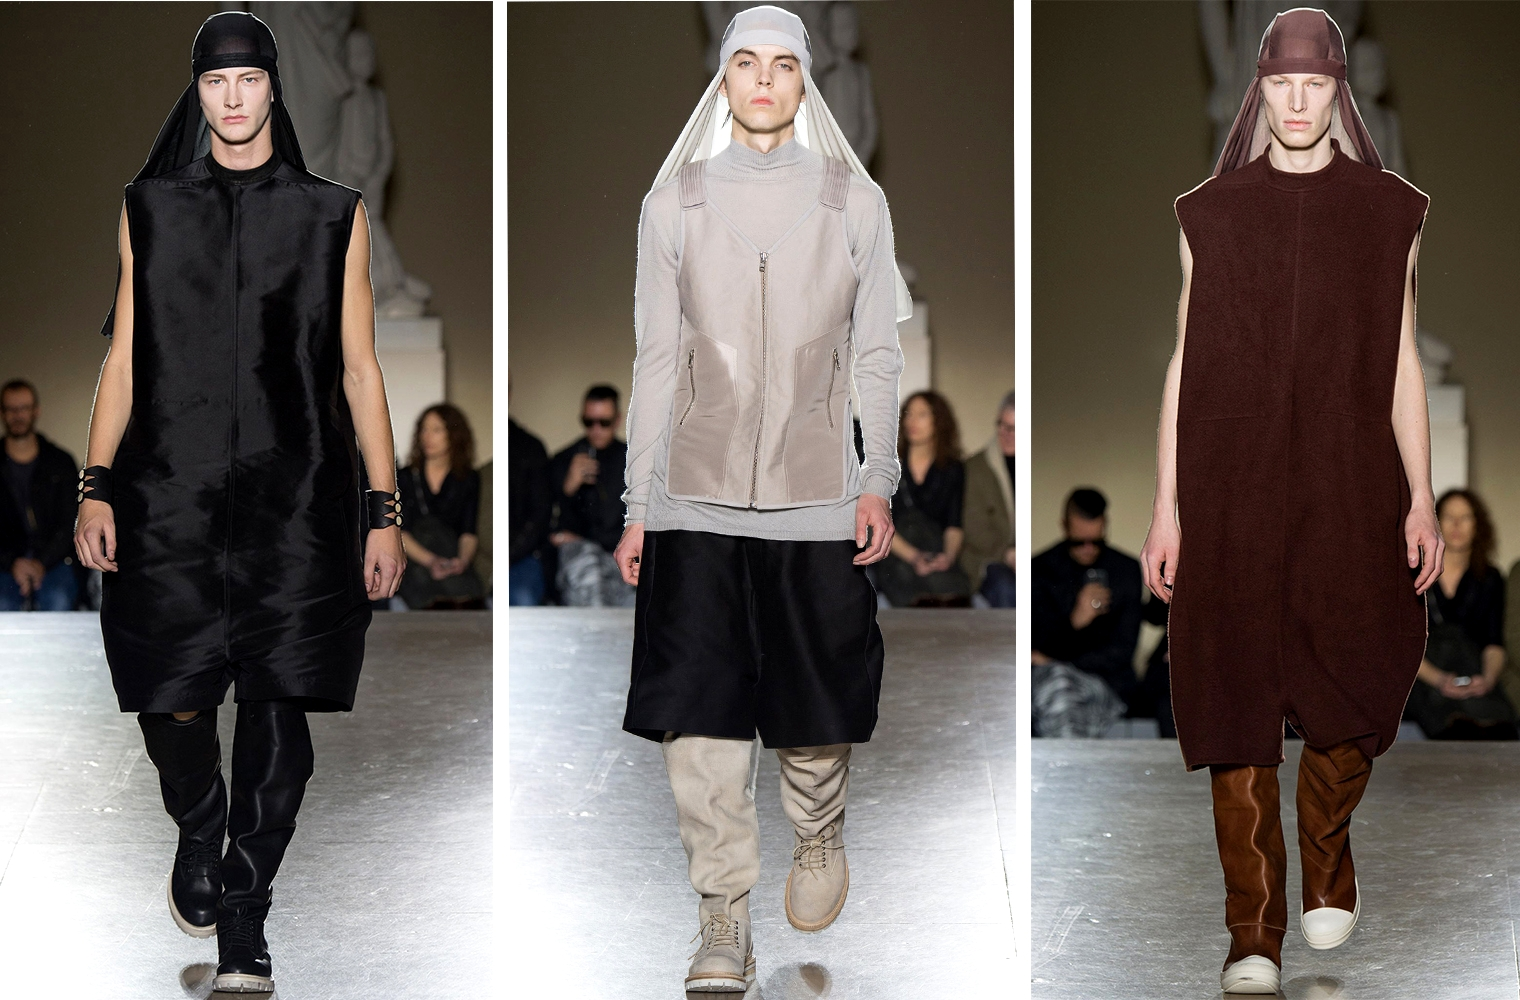 Дюраг в коллекции Rick Owens Fall/Winter 2014 Menswear